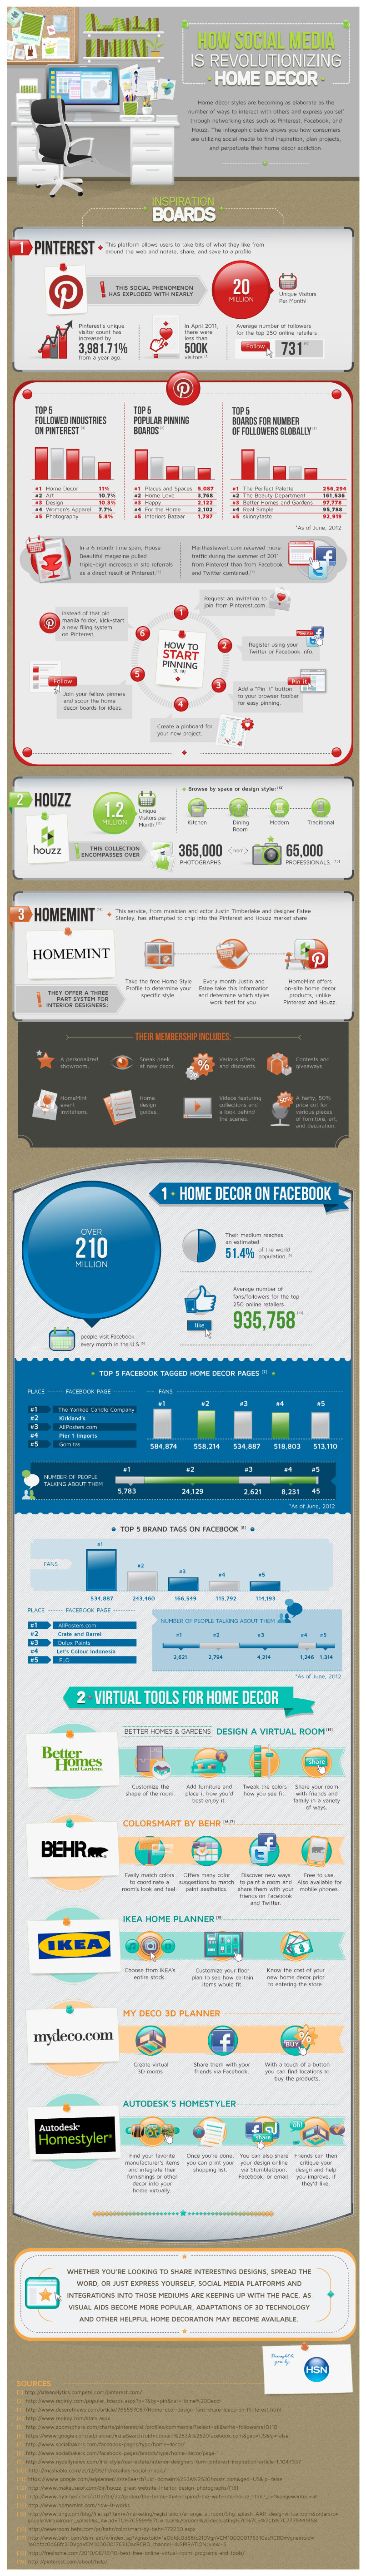 How Social Media Is Revolutionizing Home Decor